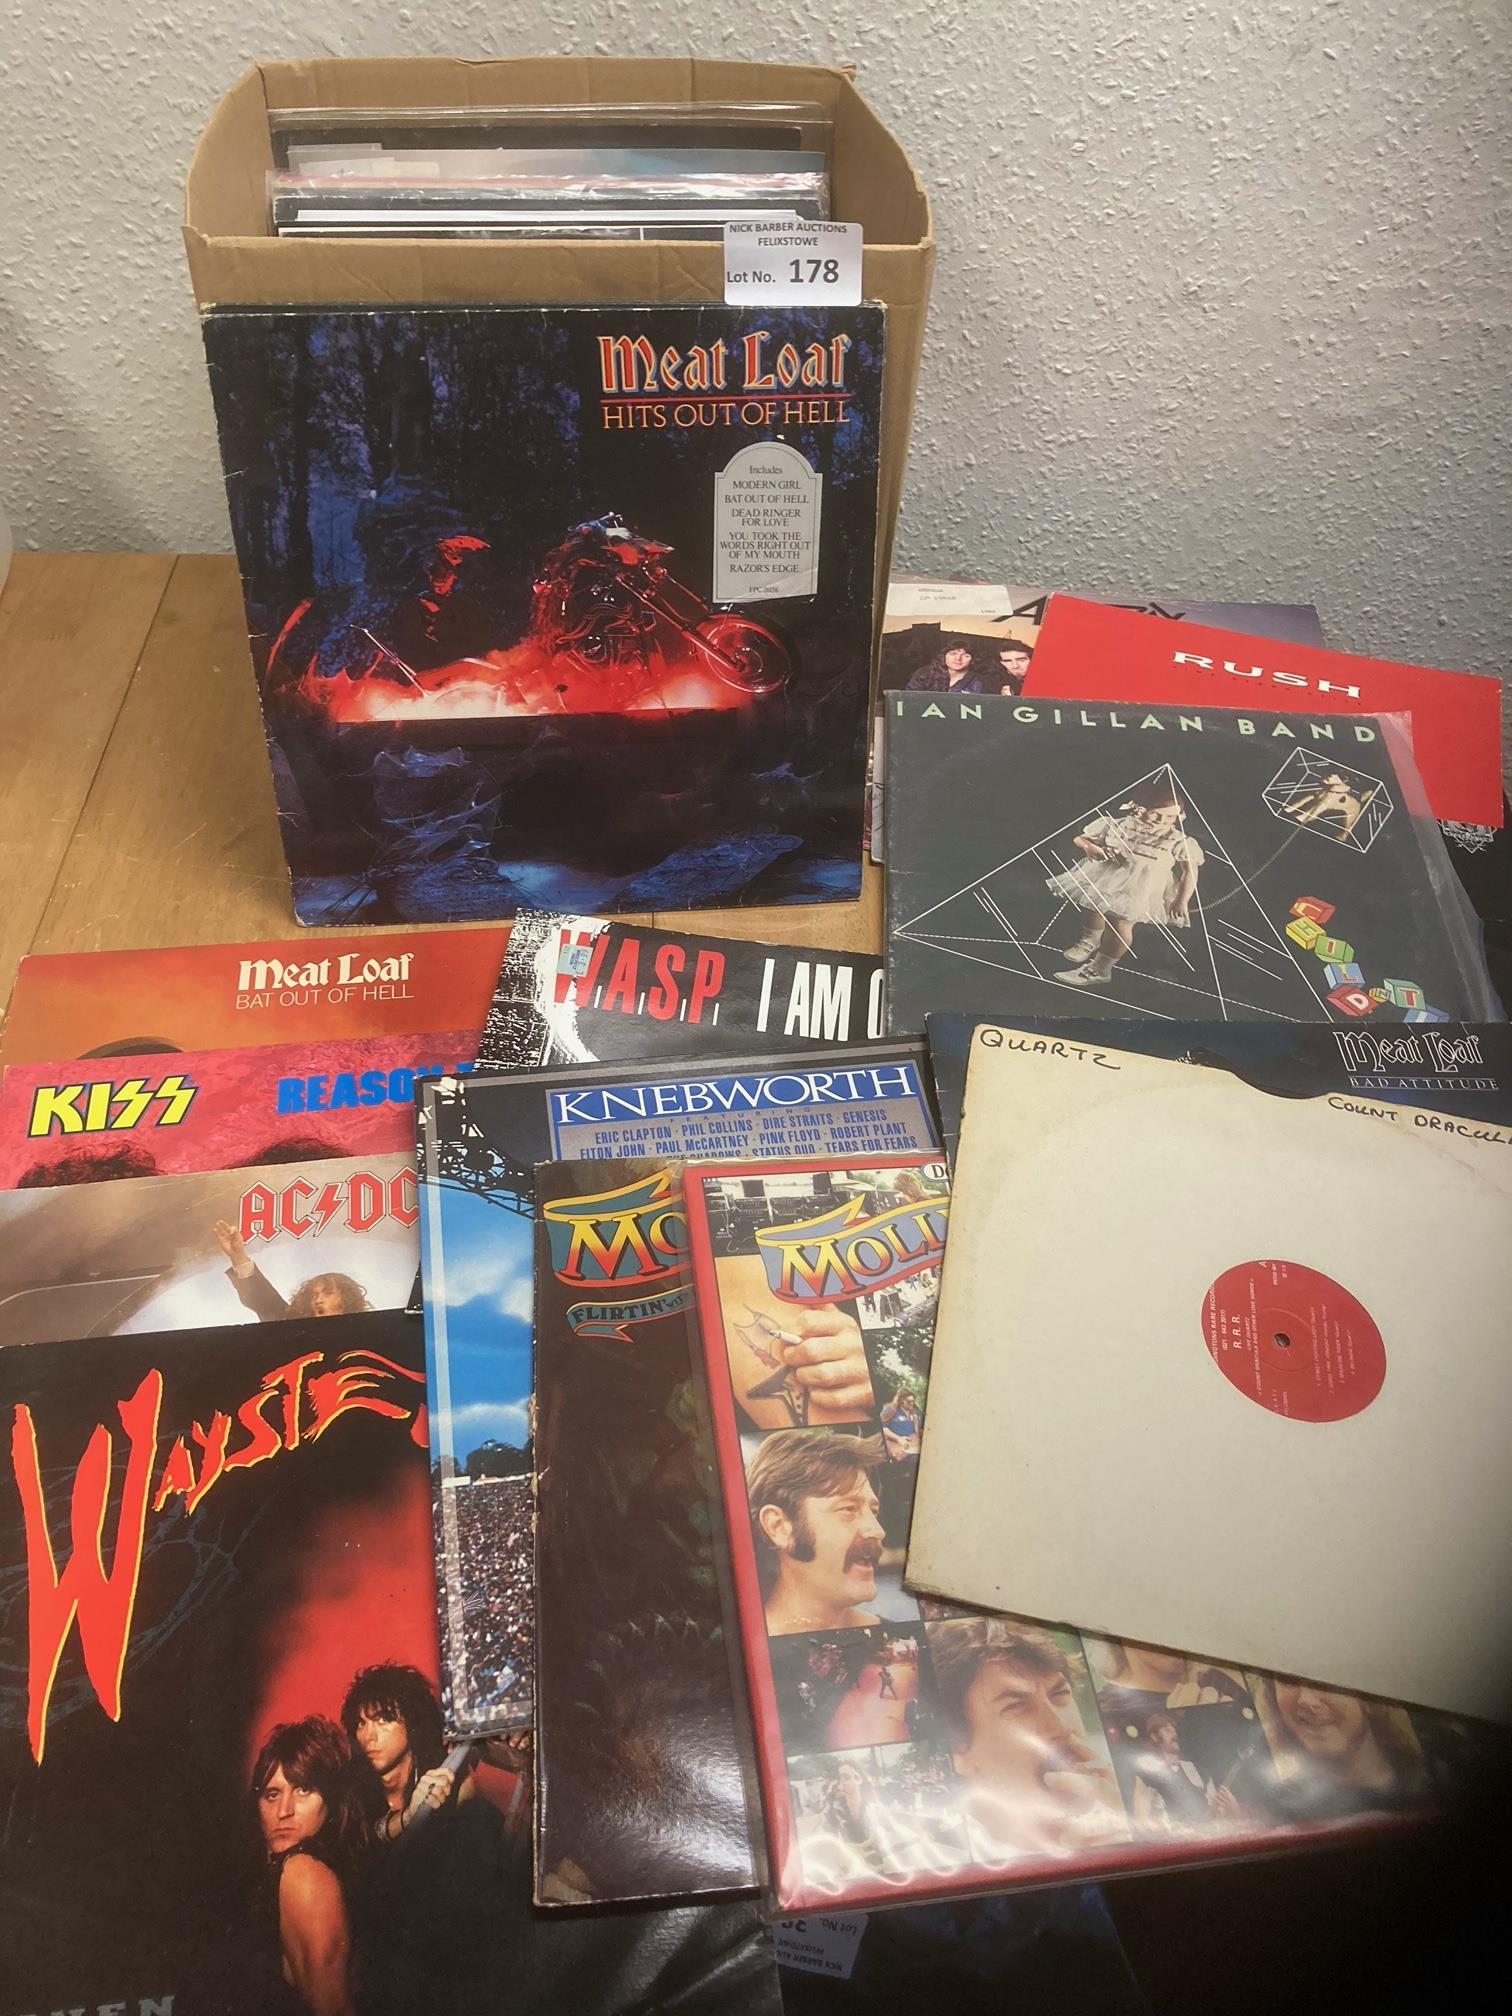 "Records : 30+ Heavy Metal 12"" singles/albums inc W"